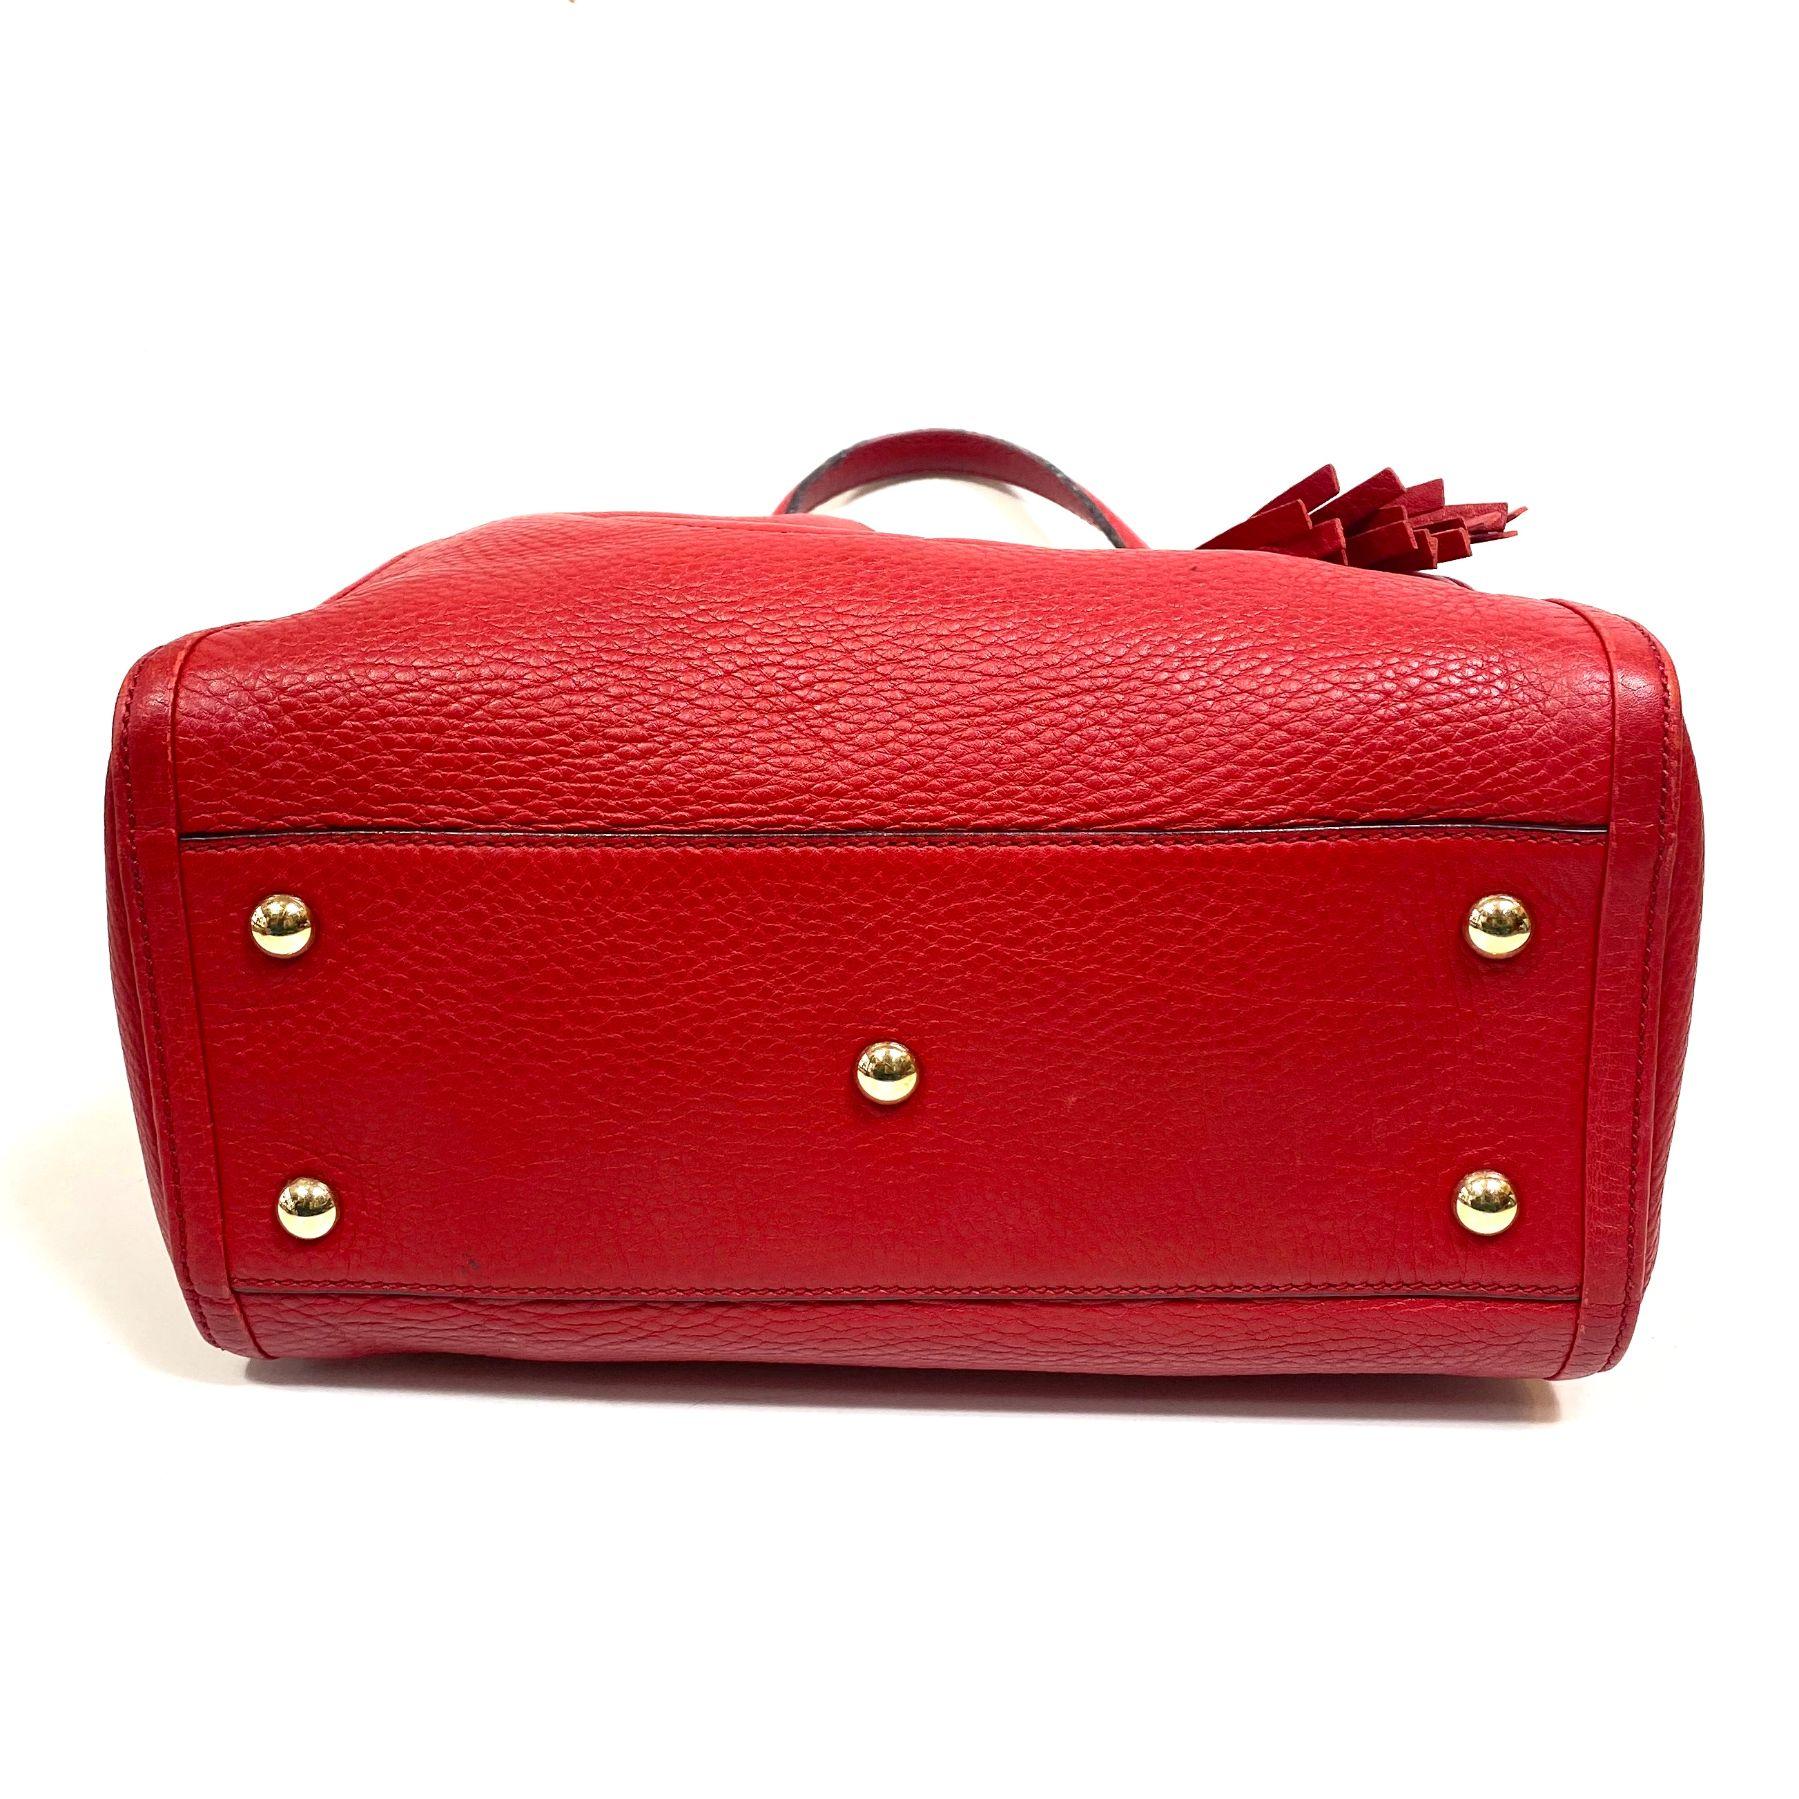 Bolsa Gucci Soho Vermelha